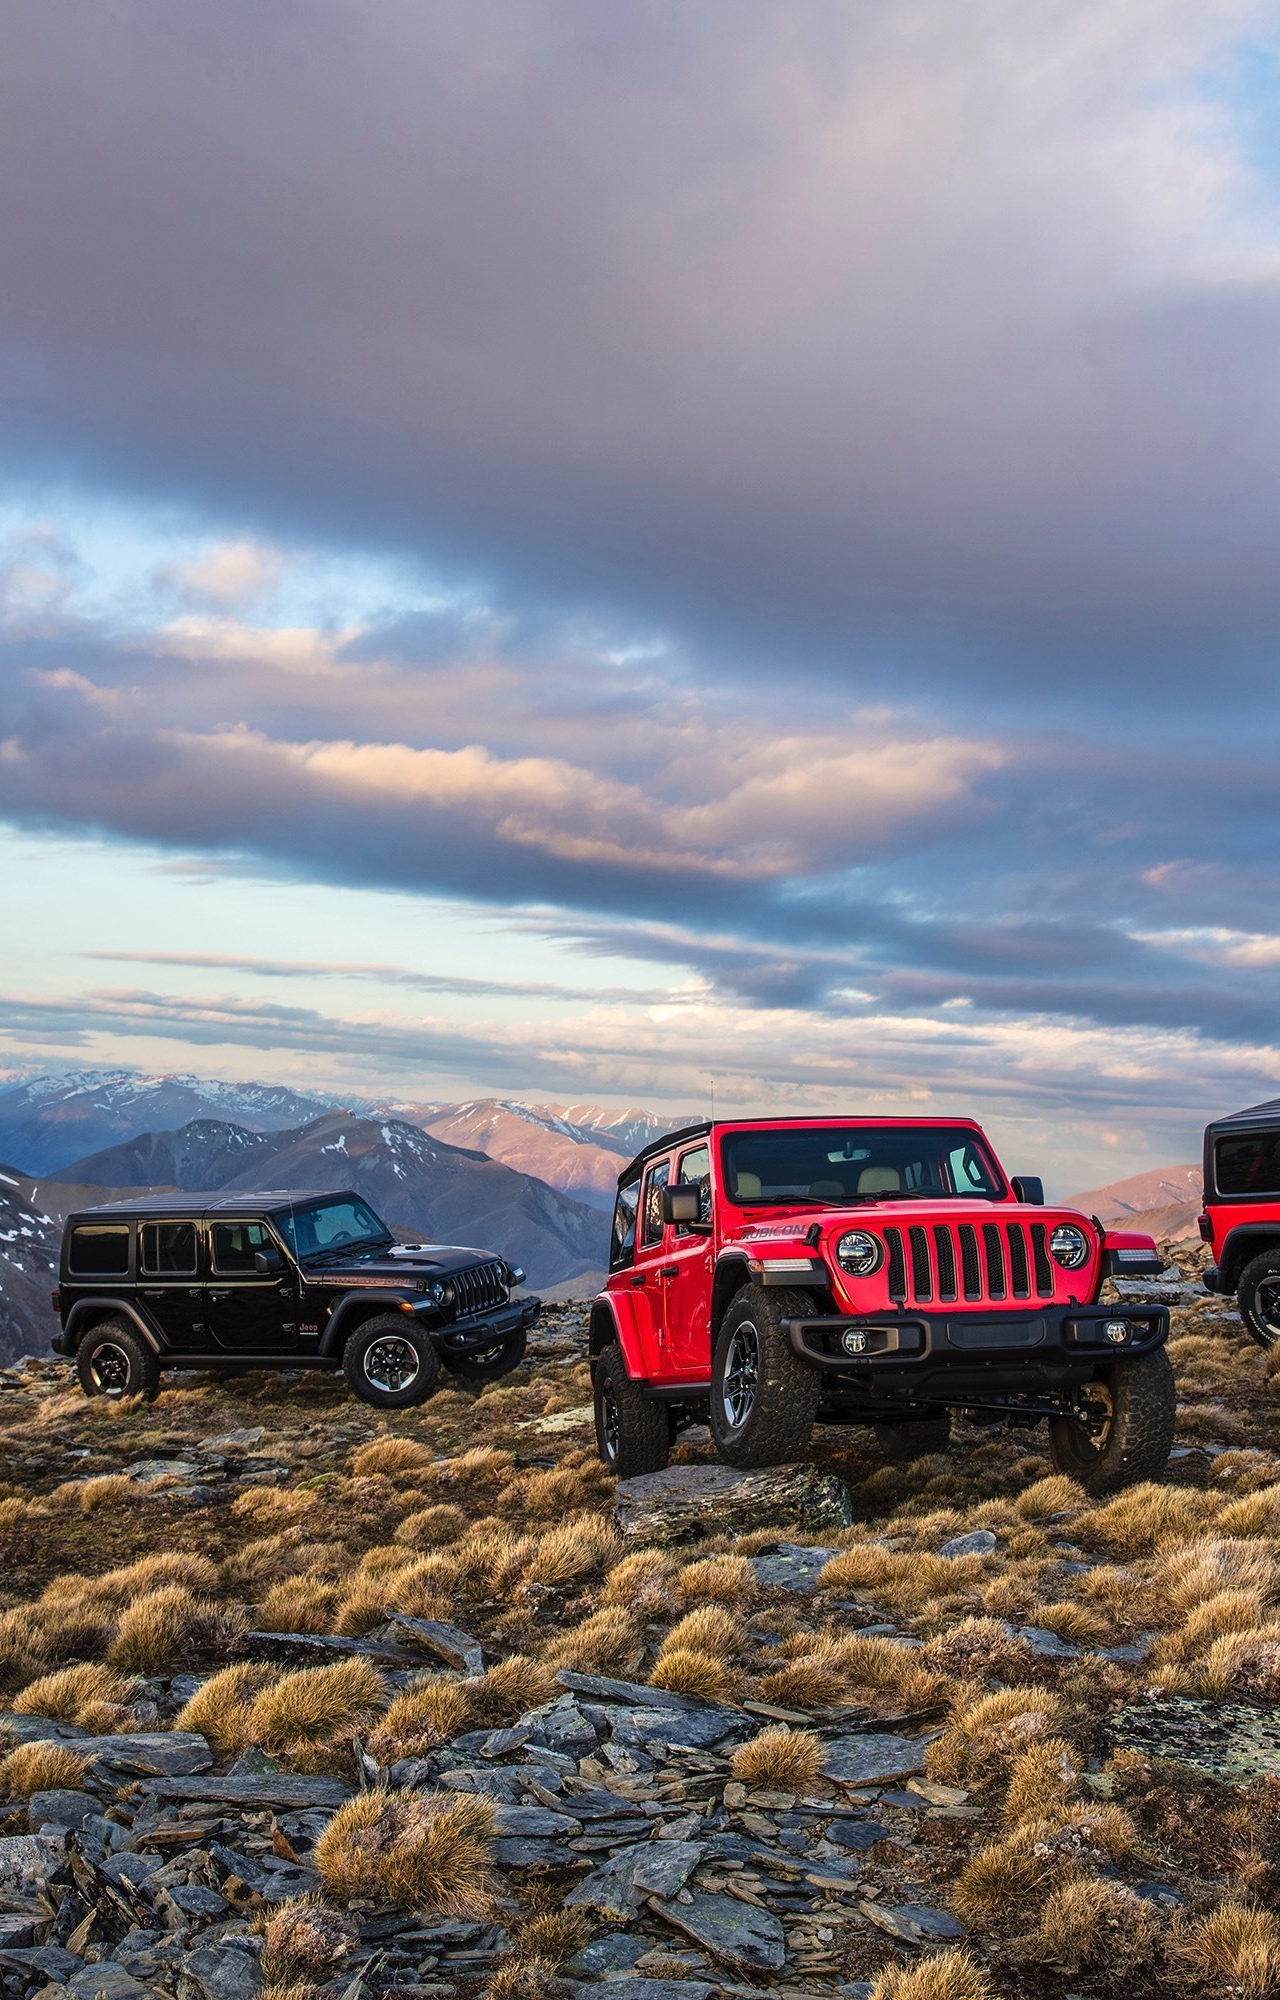 Download 1280x2120 Wallpaper Jeep Wrangler Cars Landscape